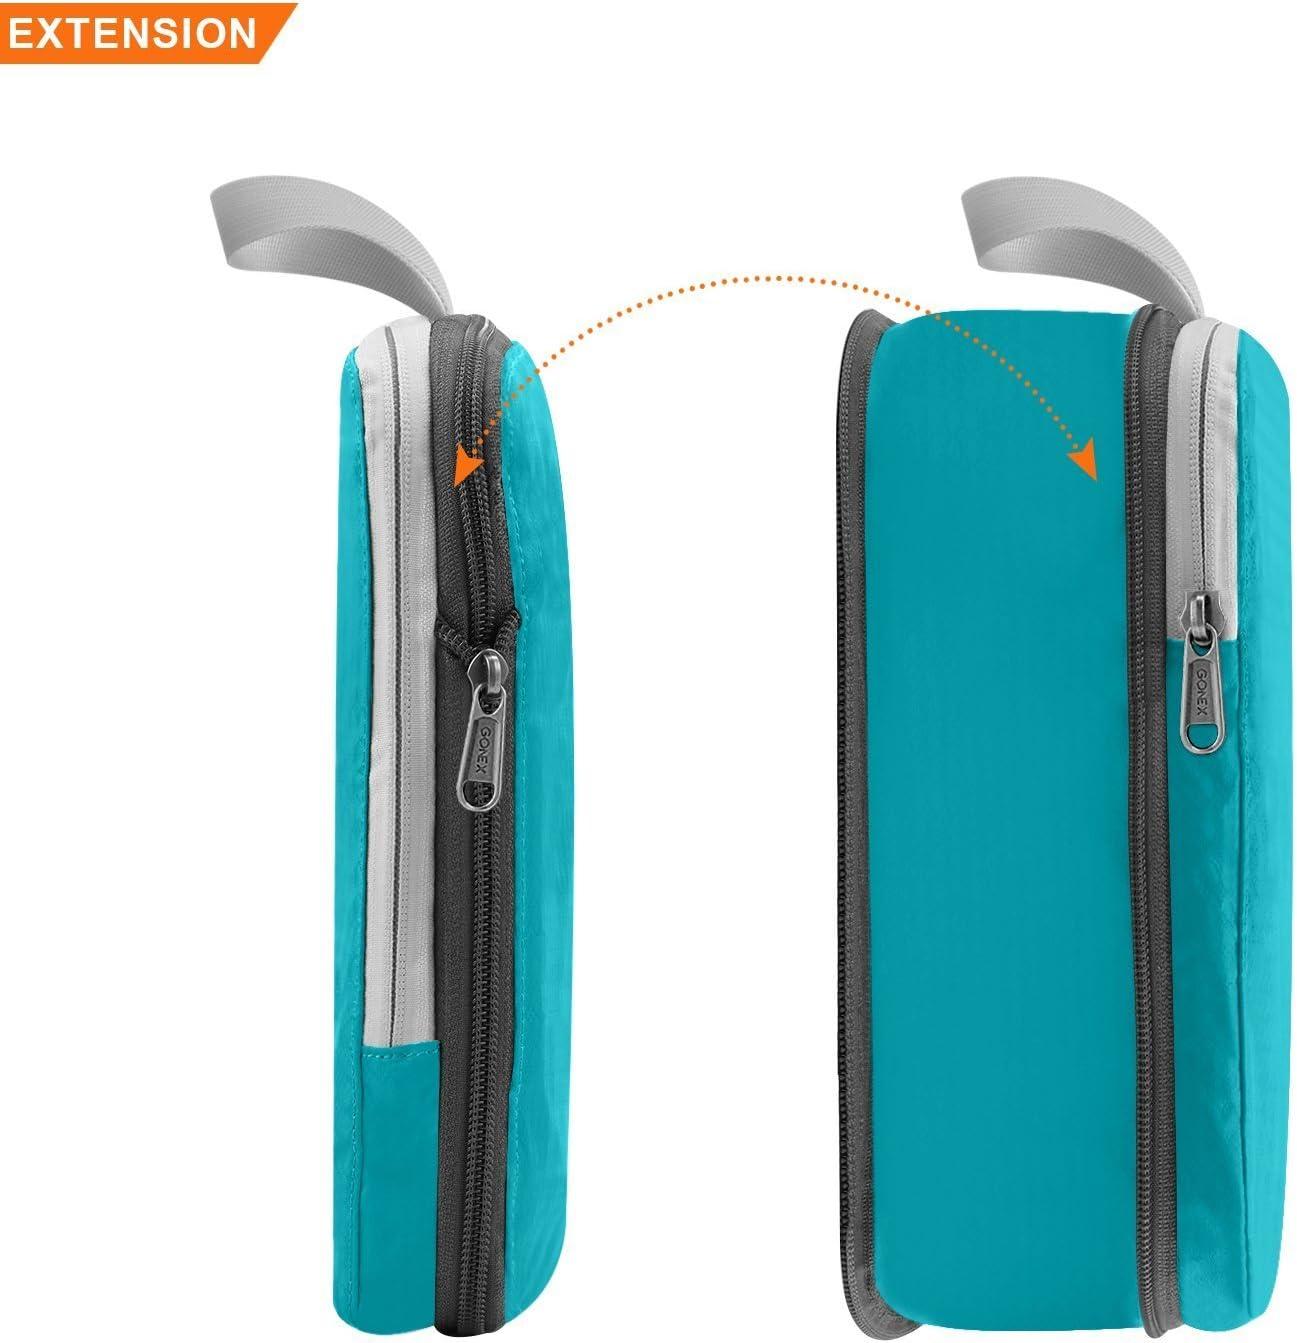 Kit de 3 pcs Bolsas Viaje Cubos Embalaje Almacenaje Extensibles Impermeable para Ropa Zapatos Cosm/éticos Accesorios Portatrajes Neceser Port/átil Gonex Organizador Maletas Equipaje Azul Claro